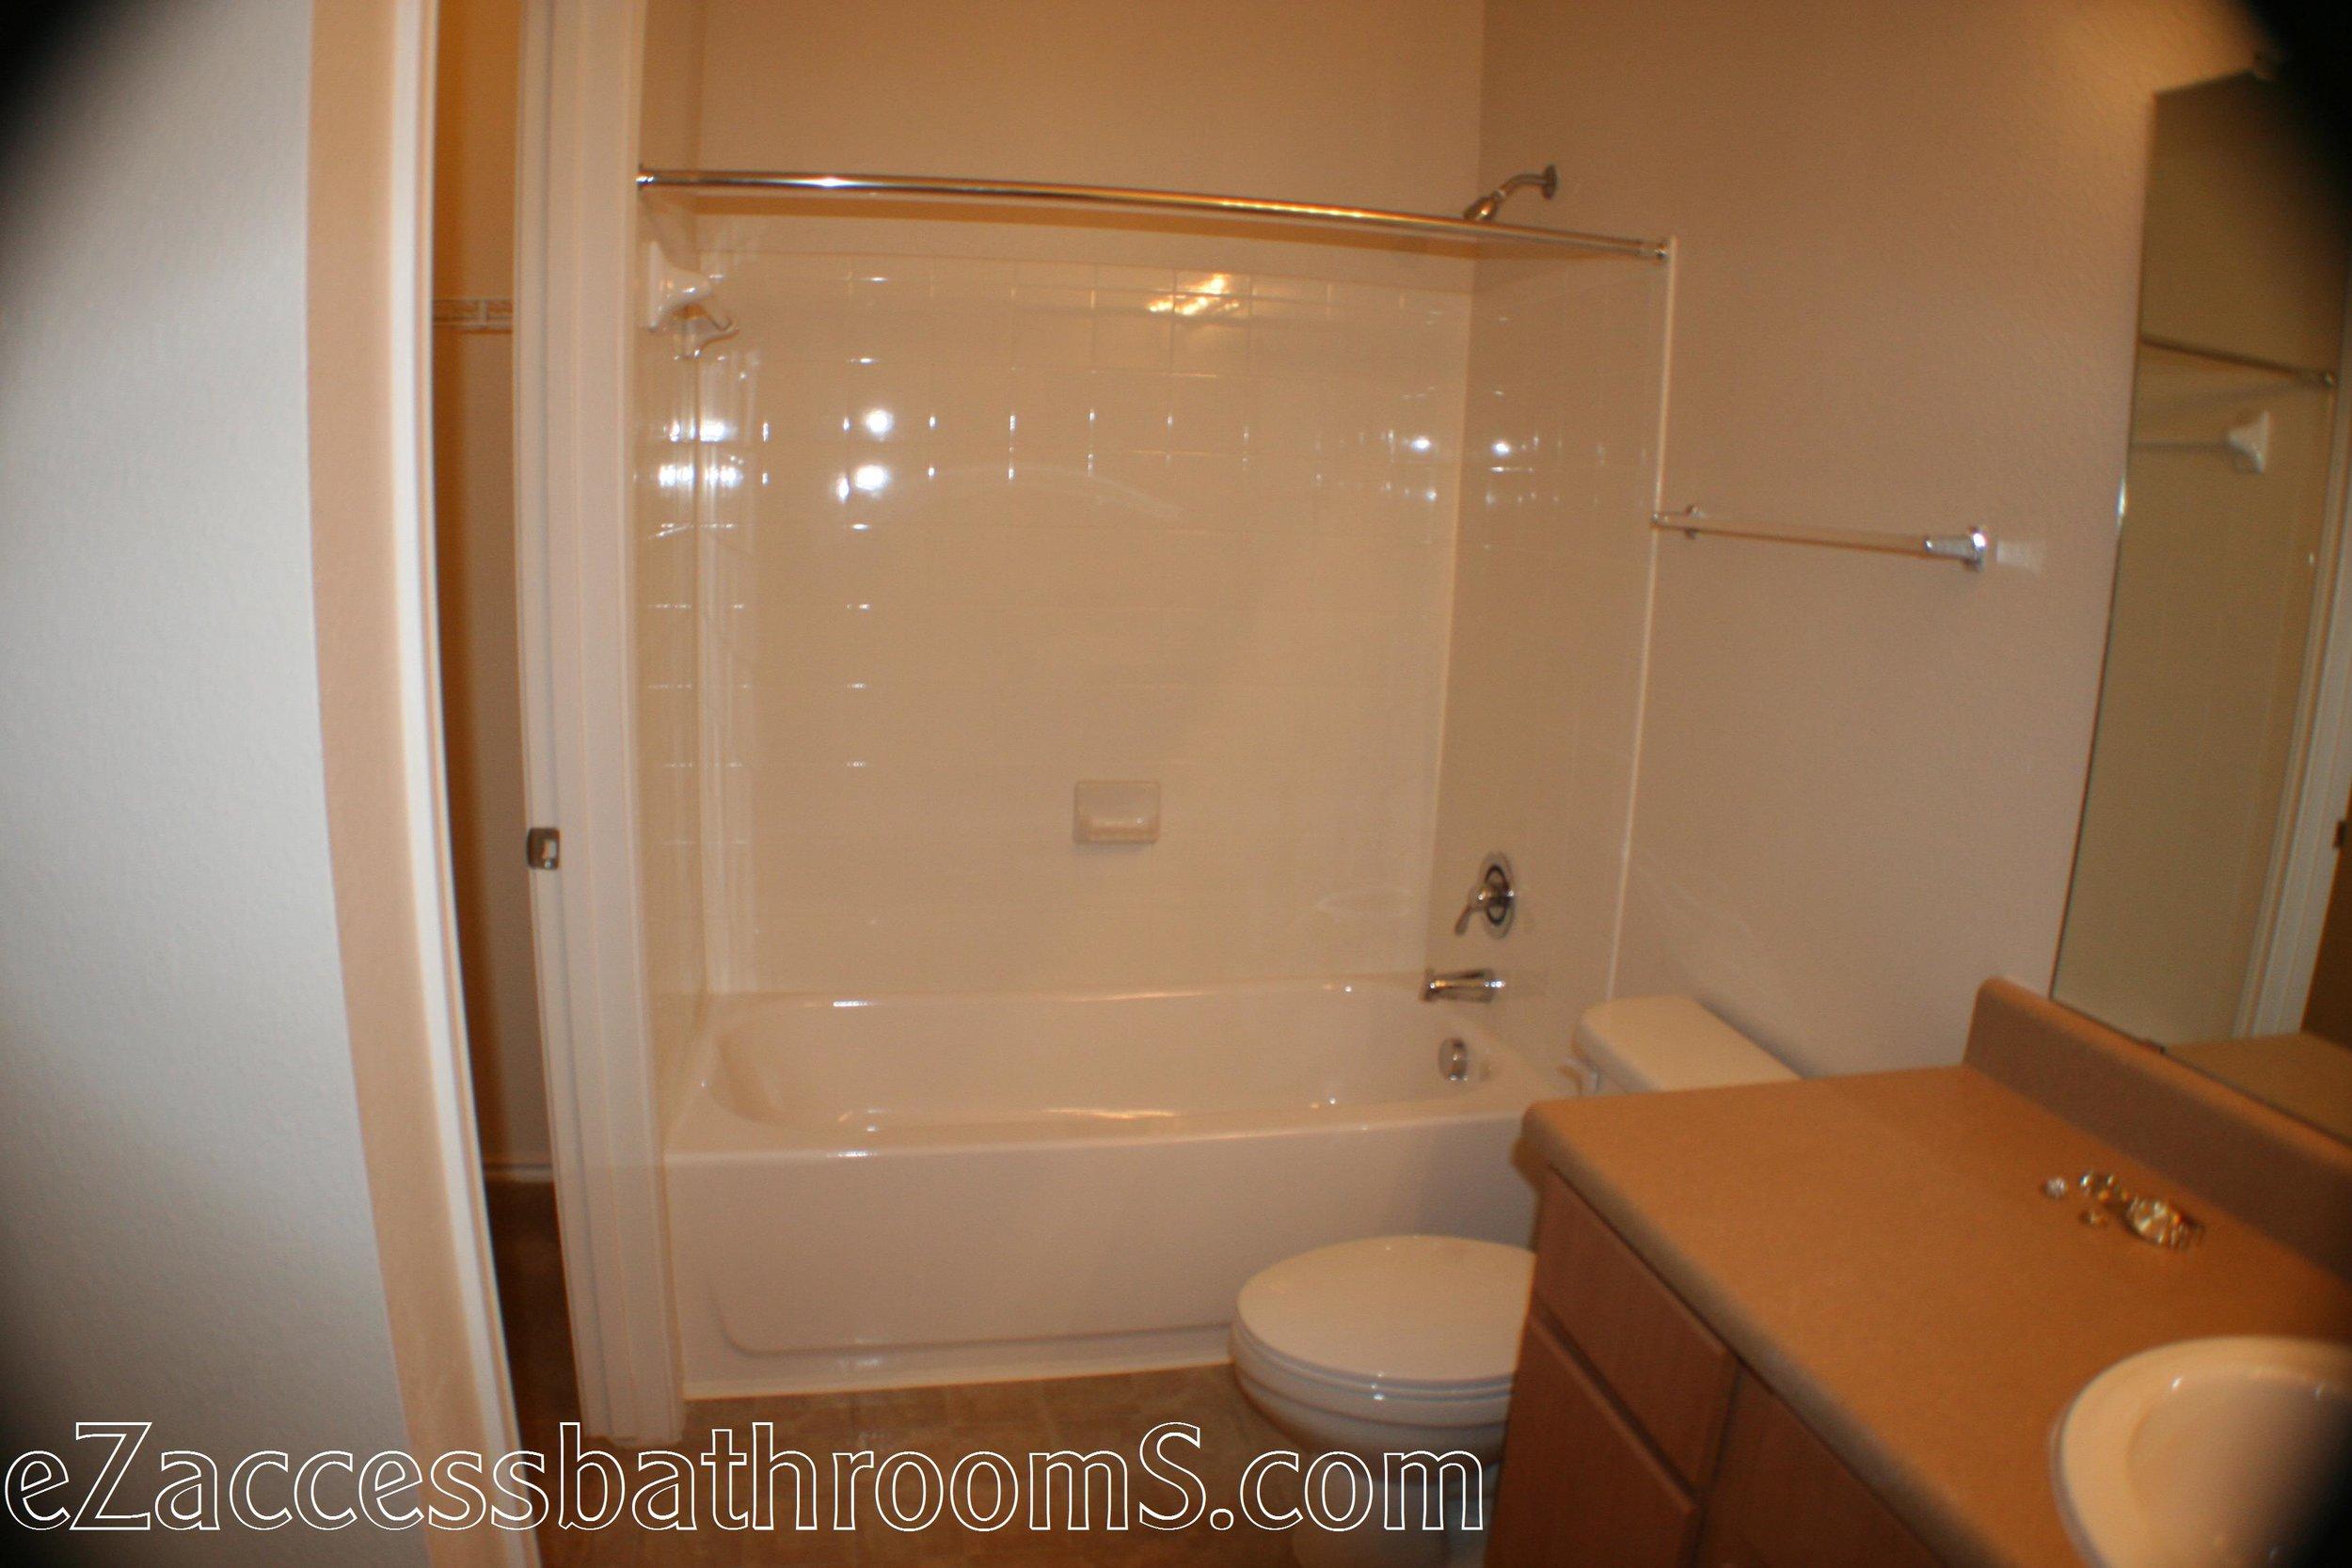 cheap tub to shower conversion ezaccessbathrooms.com 004.JPG